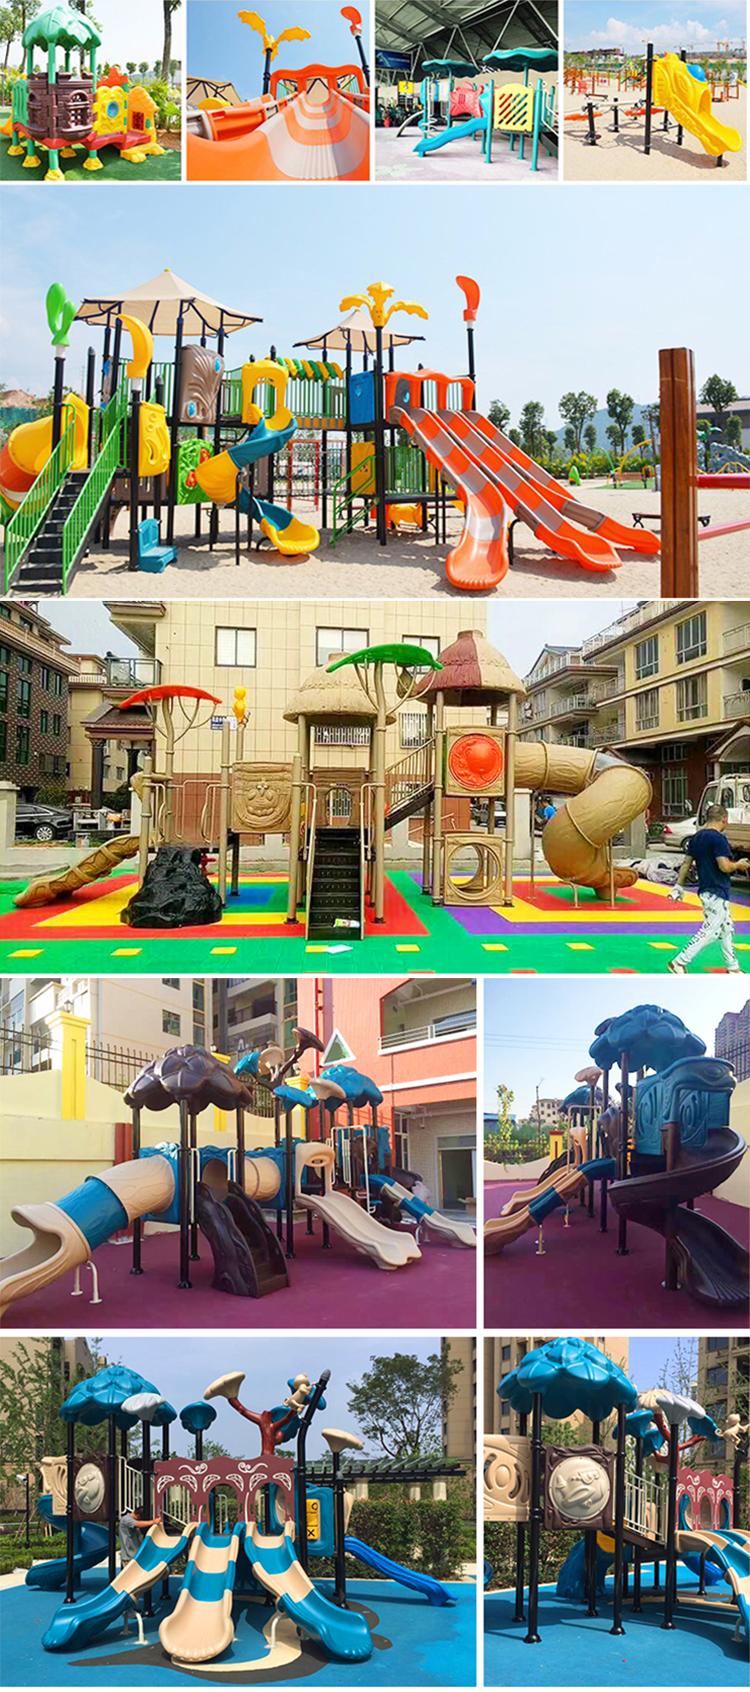 Plastic playground outdoor children playground equipment sets outdoor playsets for kids